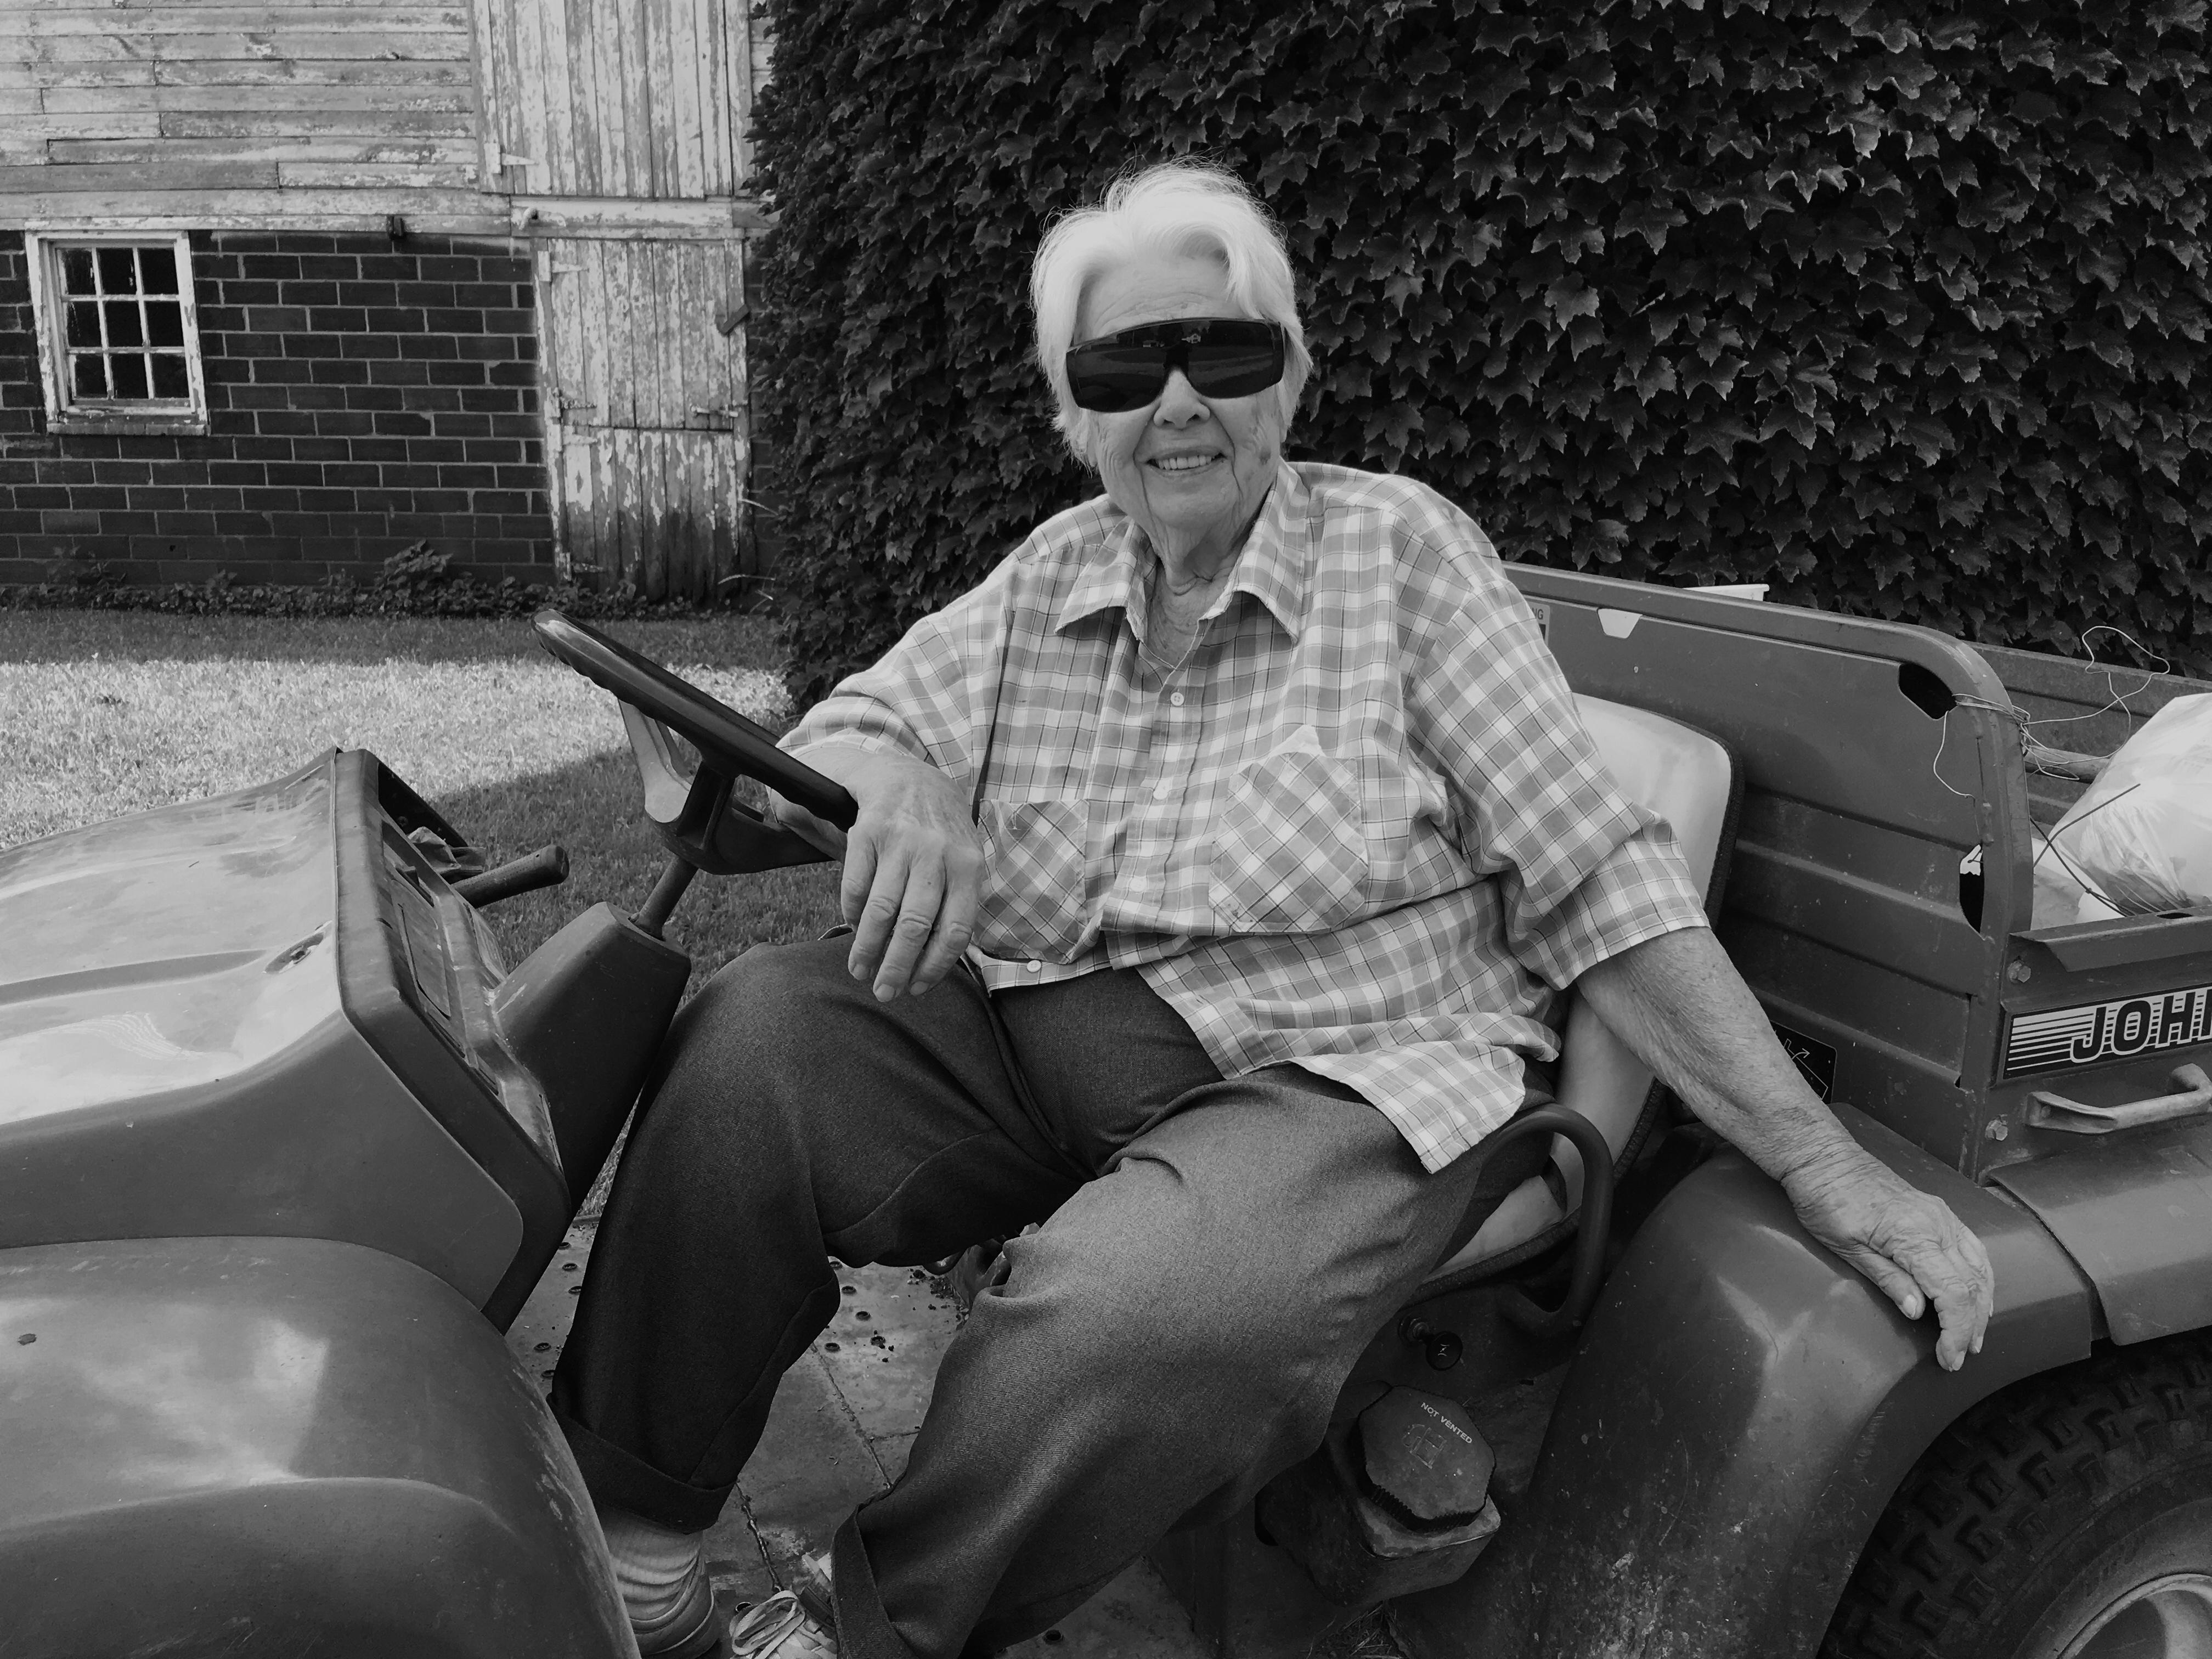 Exhibit - LeAnn Gehring-Ryan: 95...All Roads Lead Home